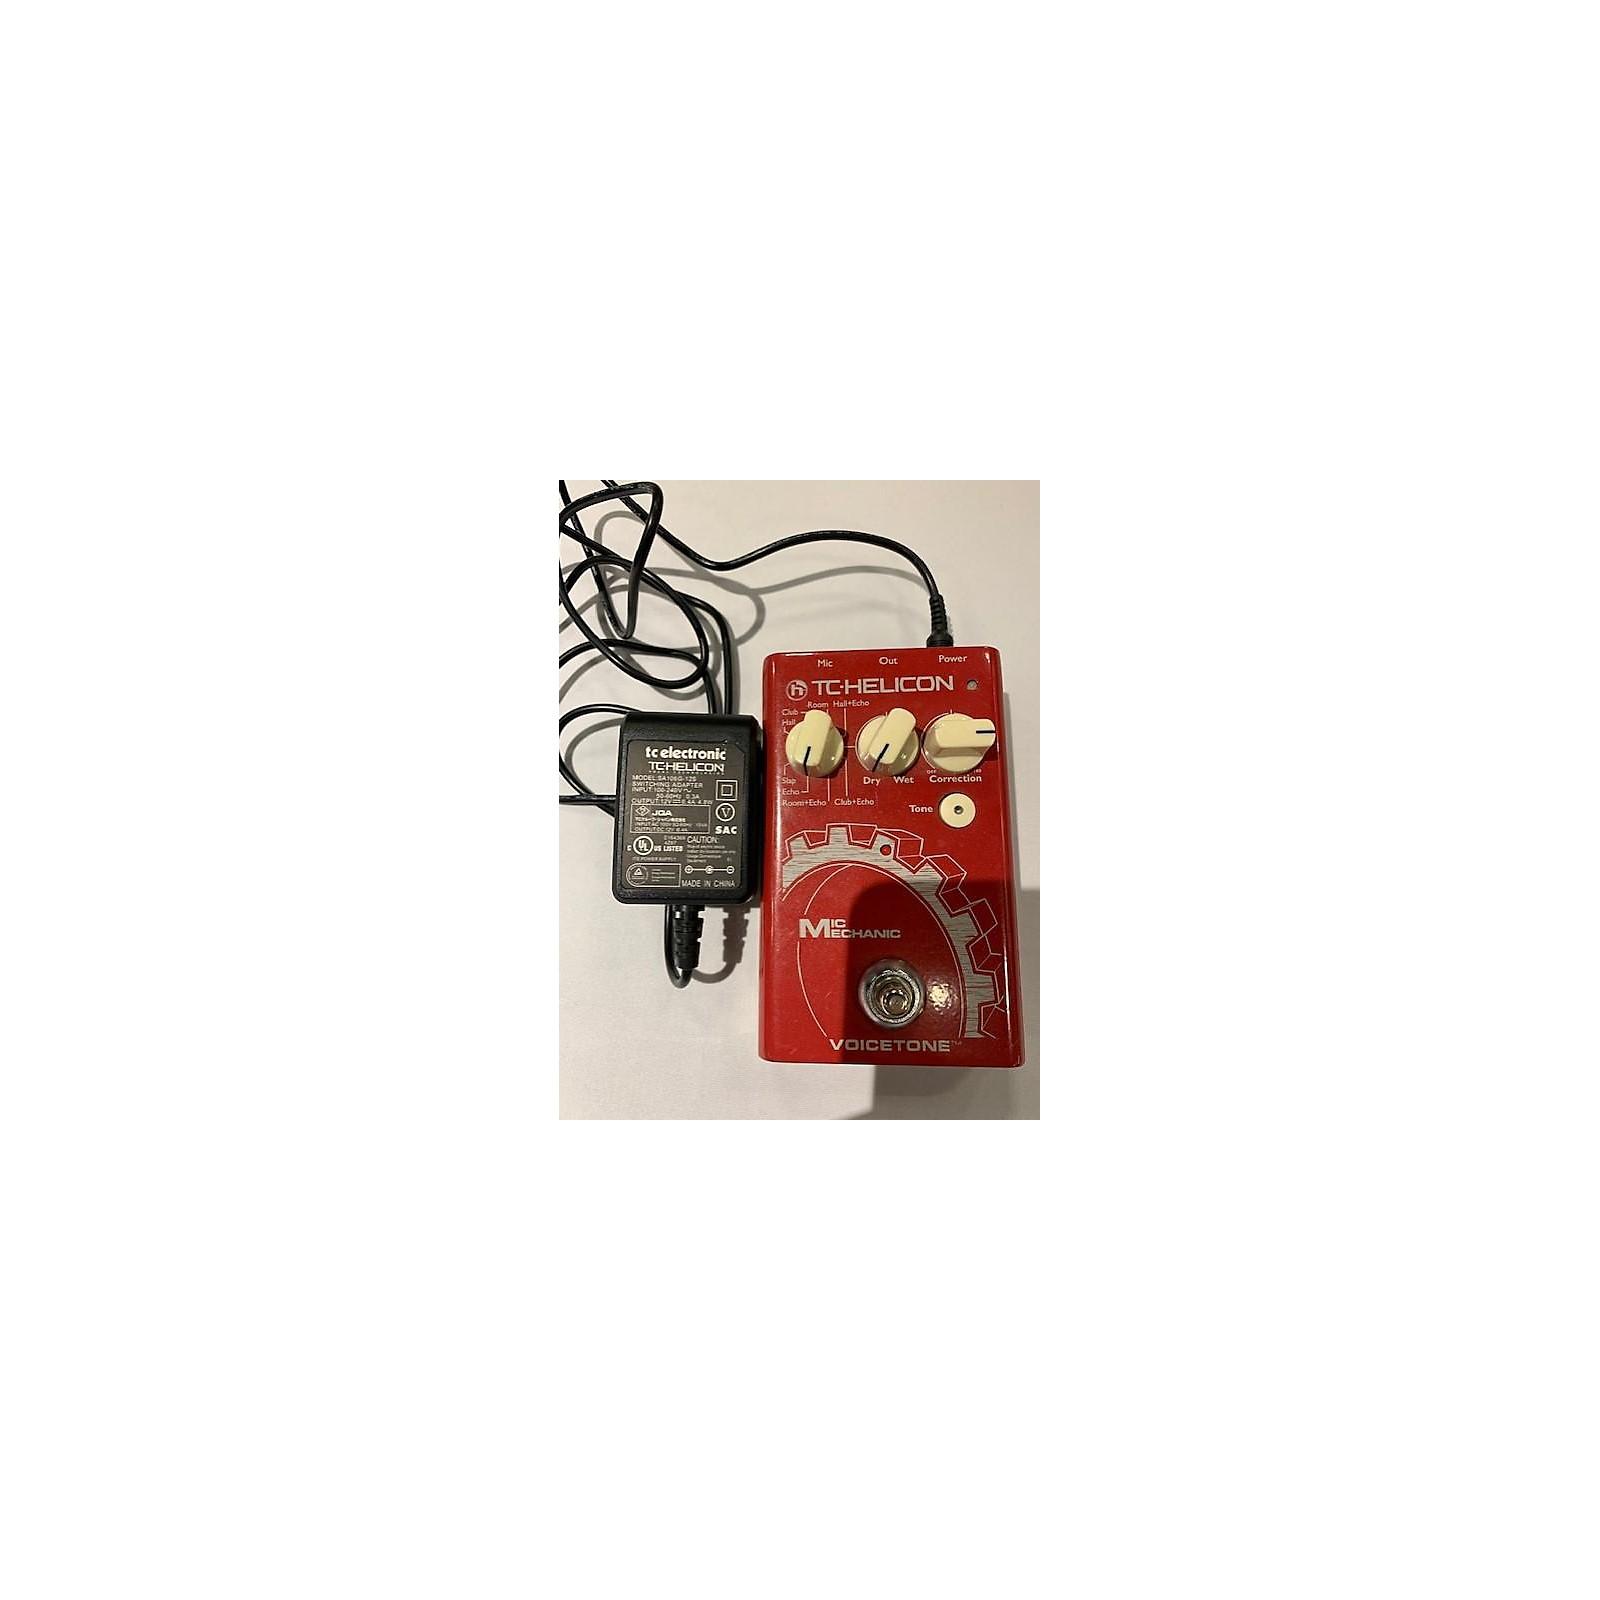 TC Helicon 2000s VoiceTone Mic Mechanic Vocal Processor